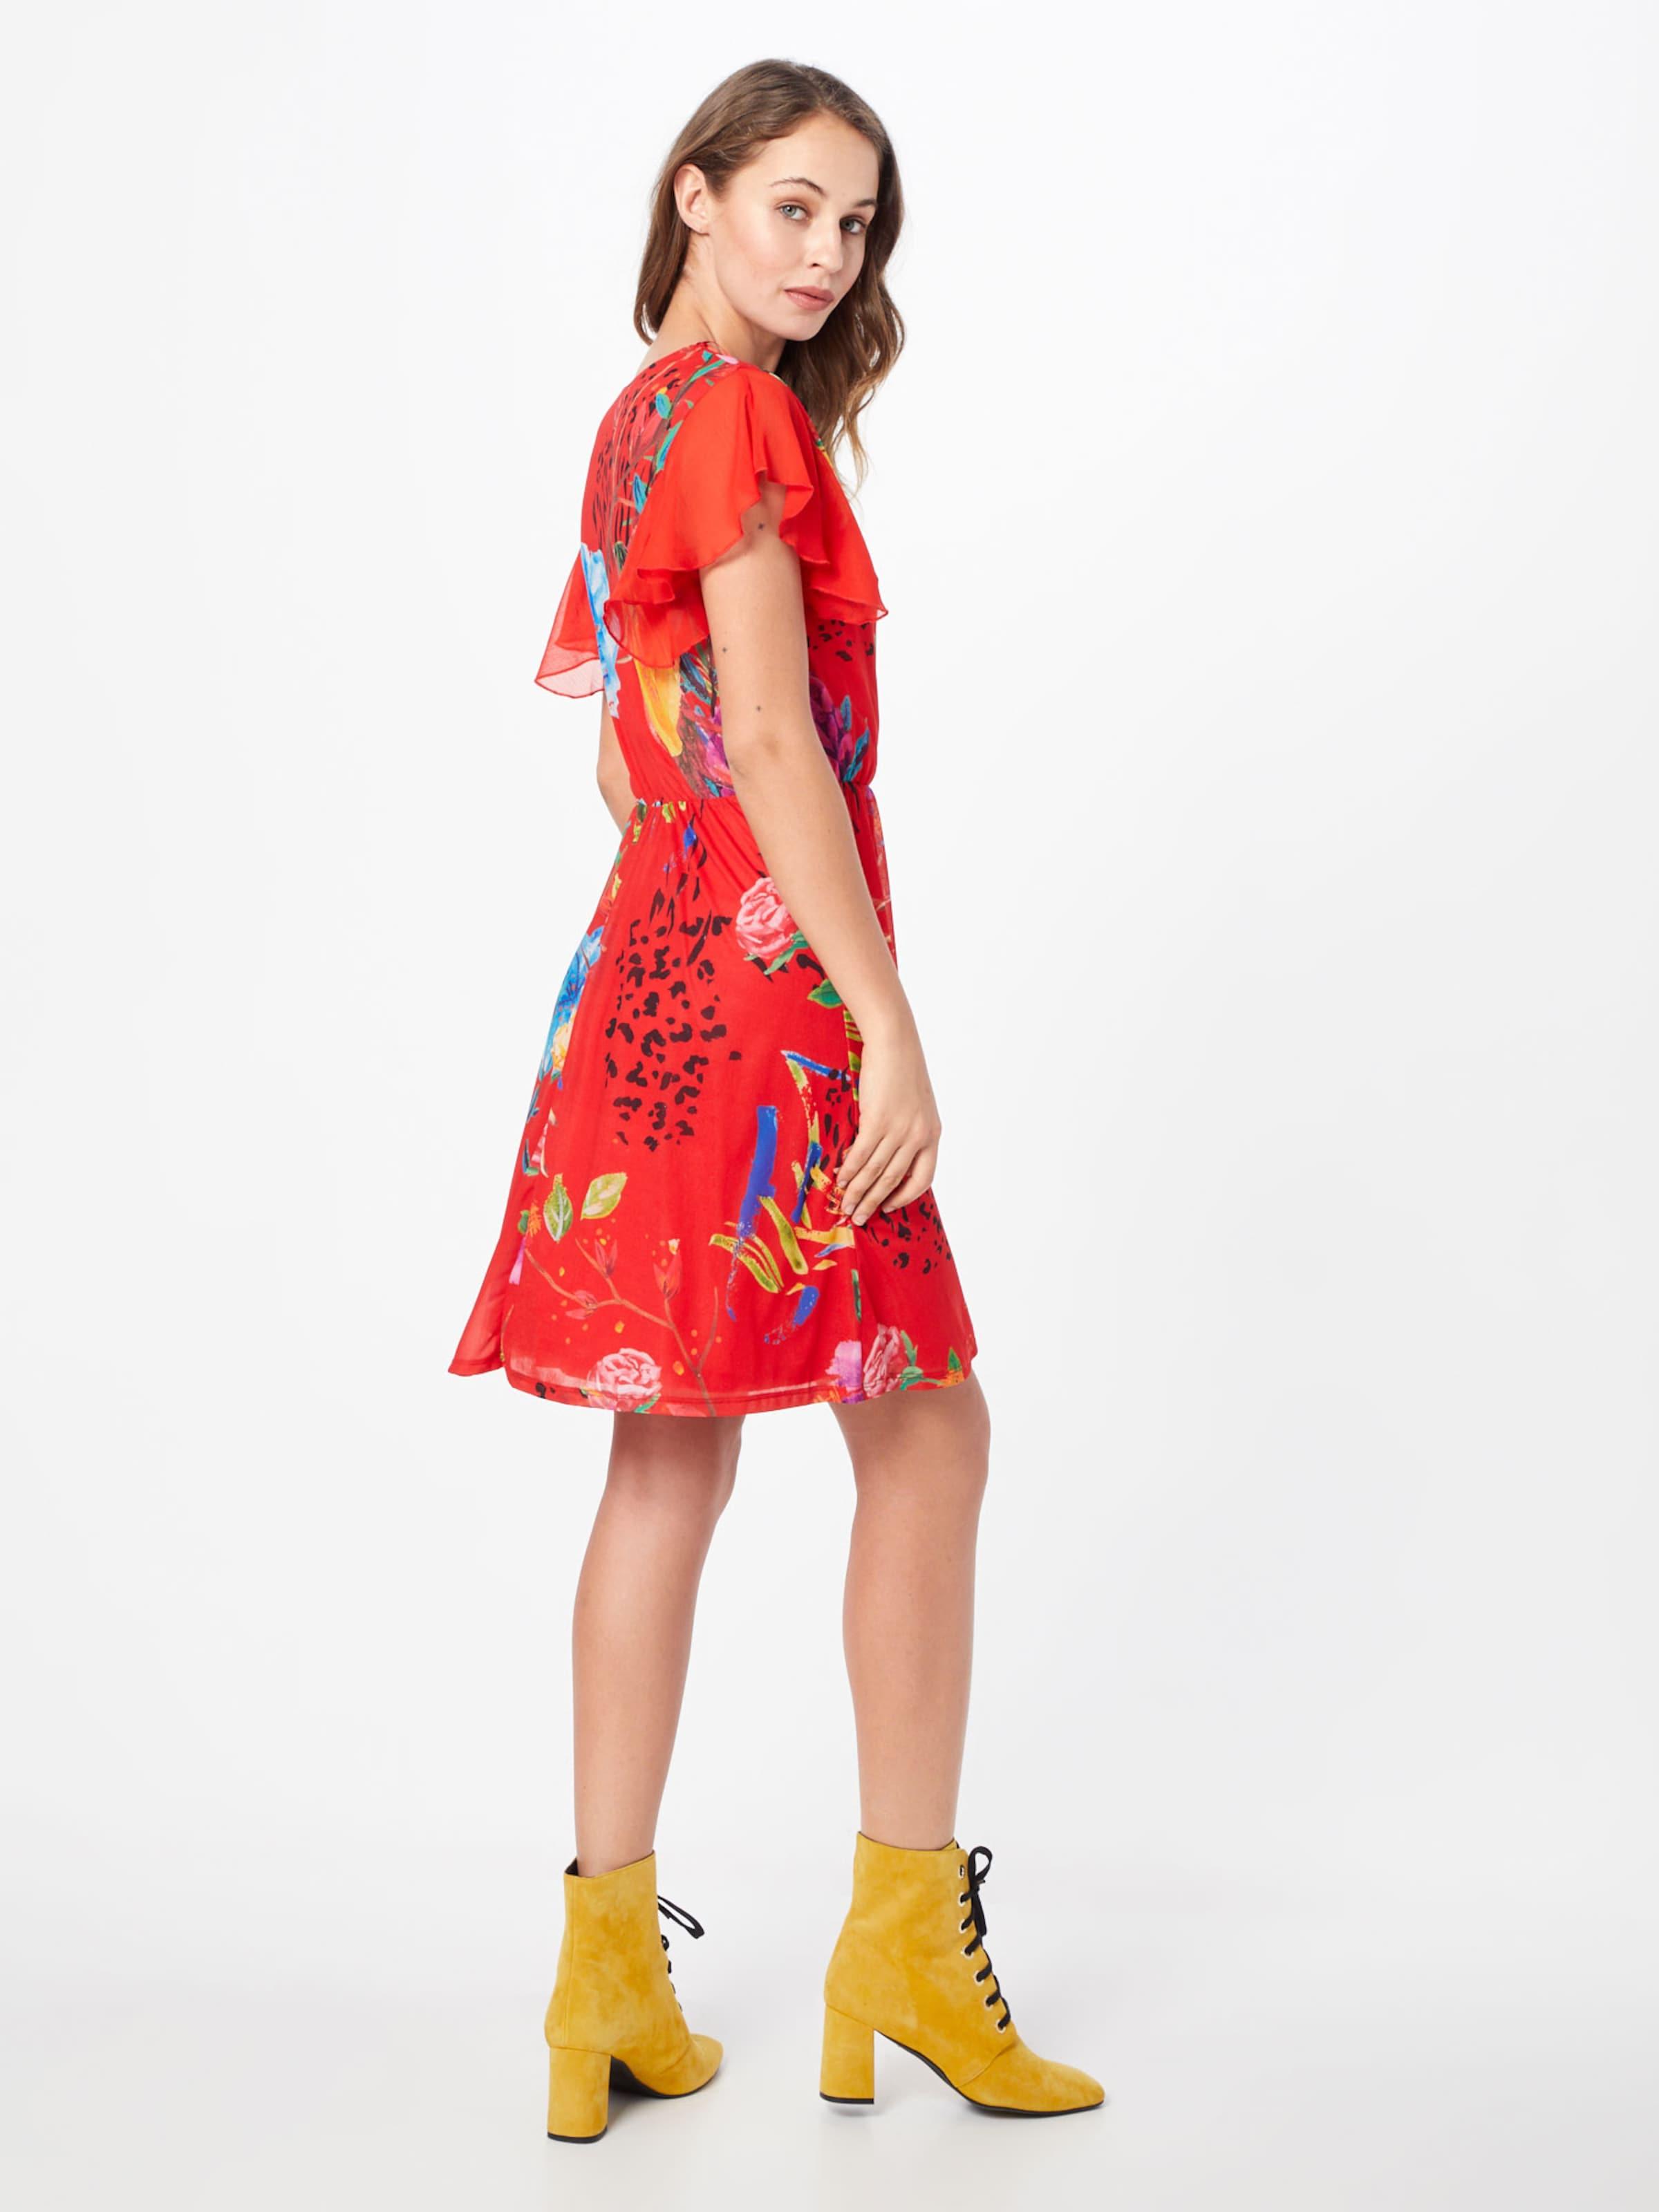 'vest Desigual Kleid miranda' In MischfarbenRot bfY7gyvmI6